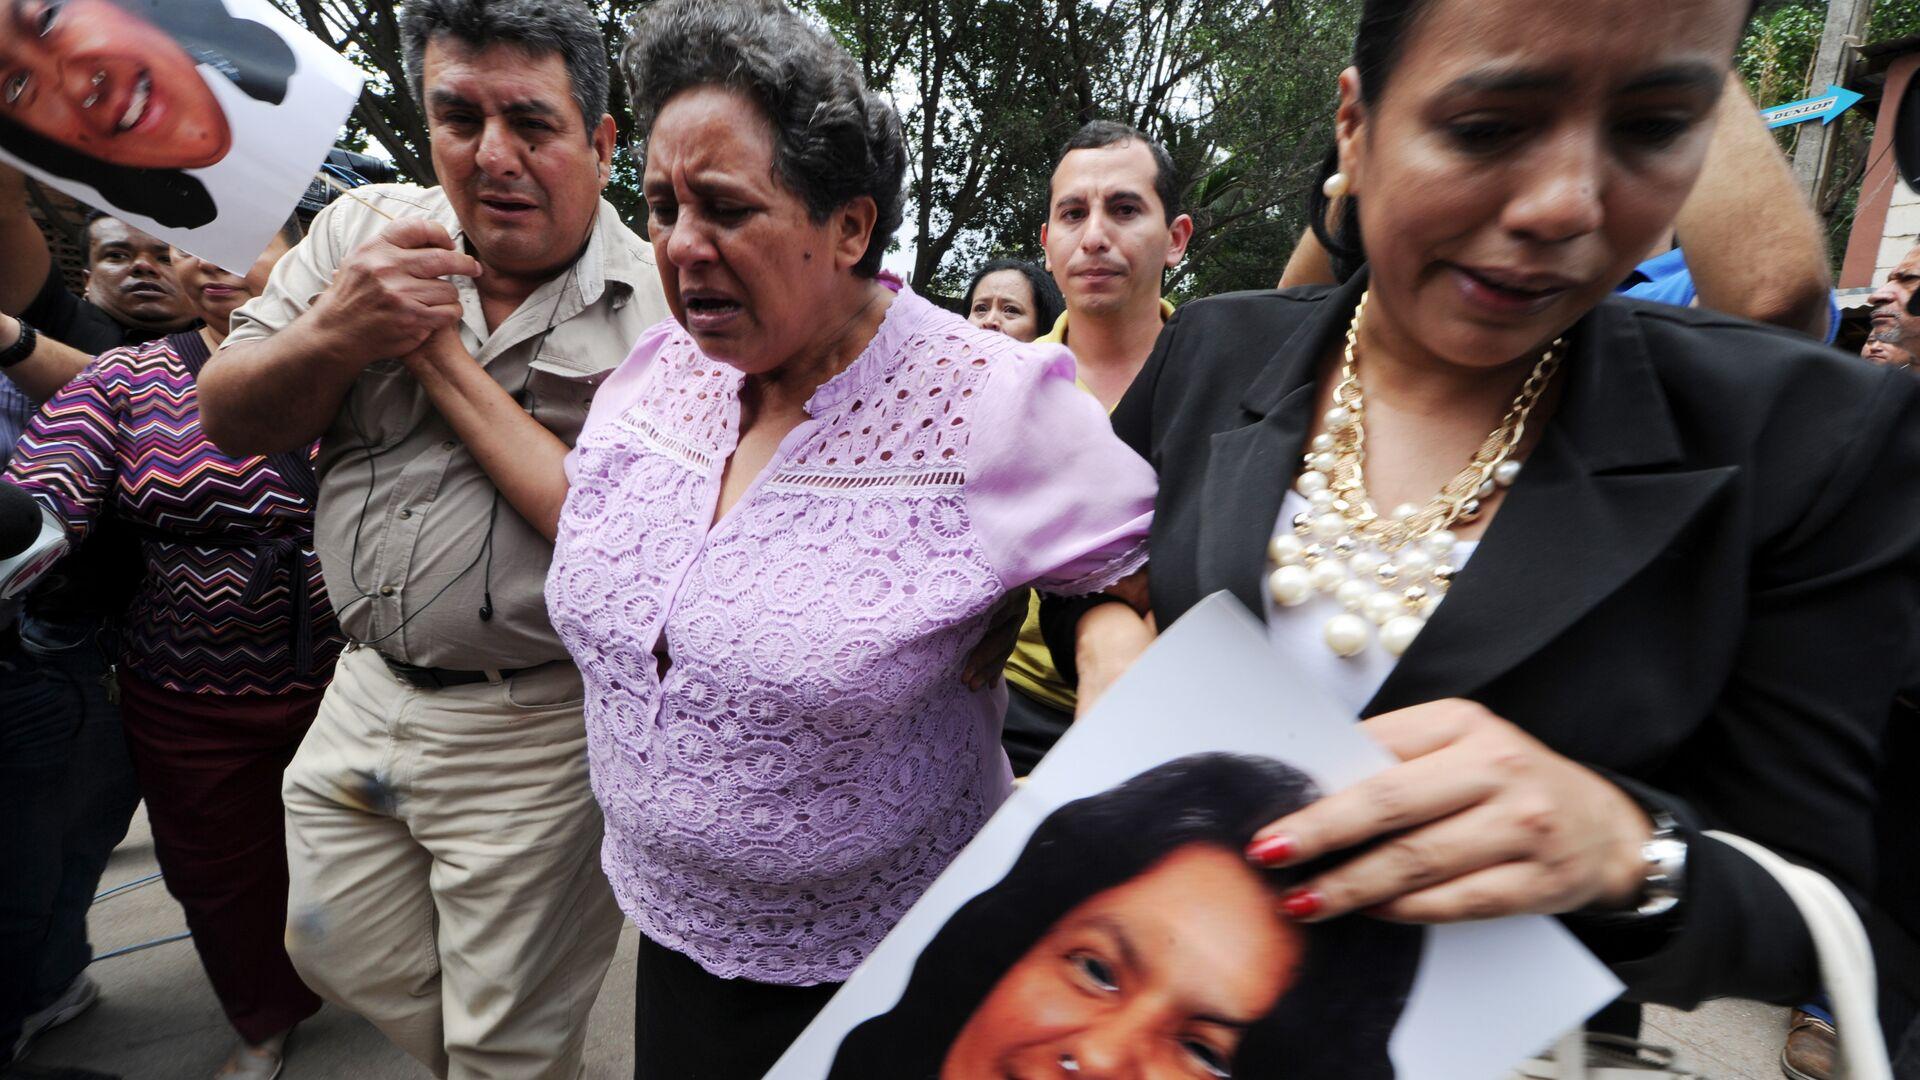 Relatives of murdered indigenous activist Berta Caceres cry, in La Esperanza, 200 km northwest of Tegucigalpa, on March 3, 2016 - Sputnik Mundo, 1920, 08.07.2021